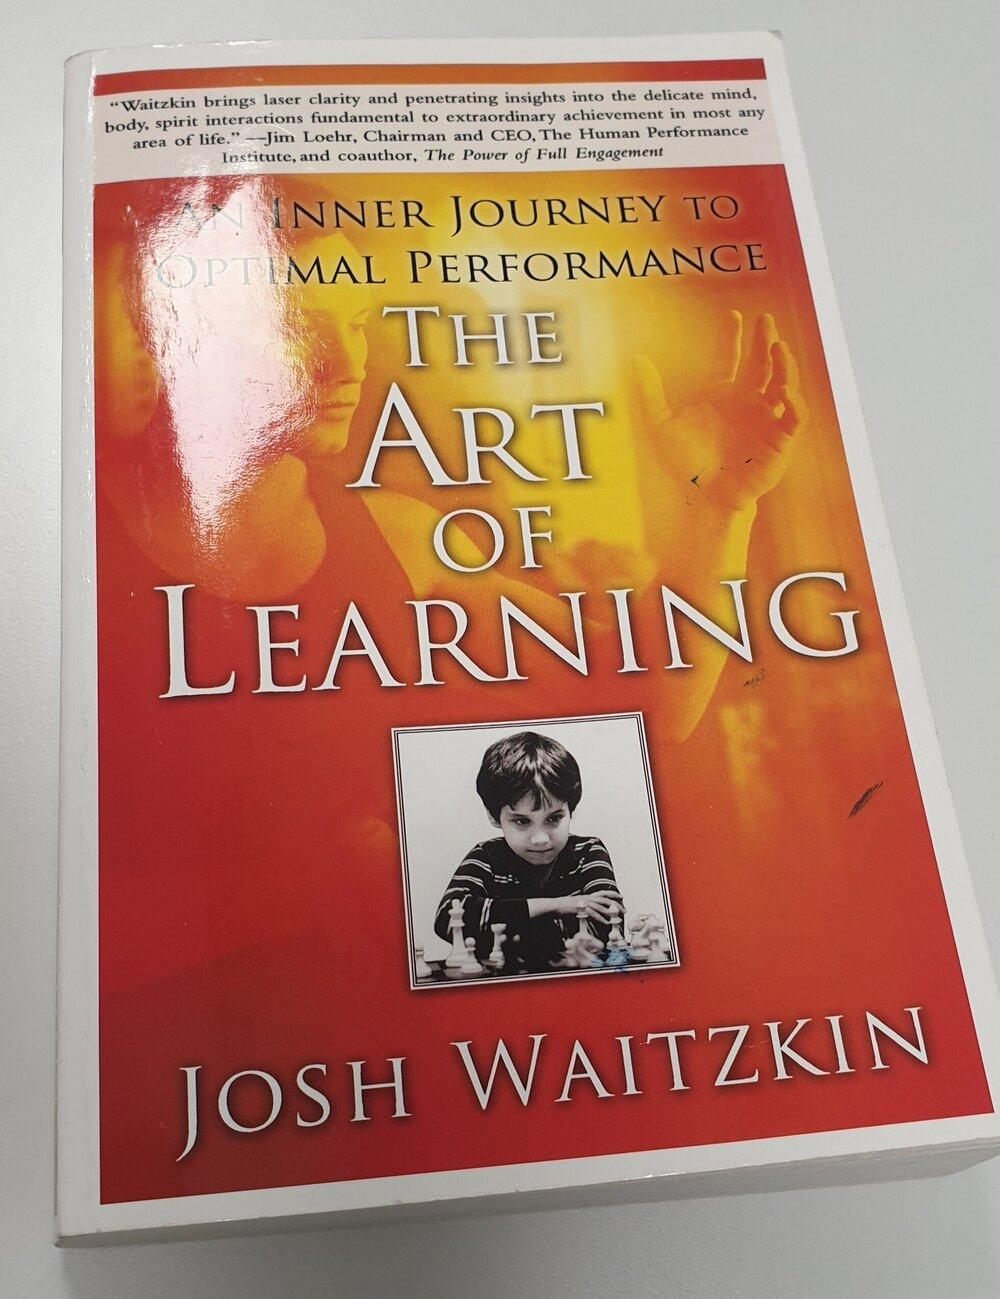 Becoming an expert in learning, according to Josh Waitzkin — Ivan Ivankovic